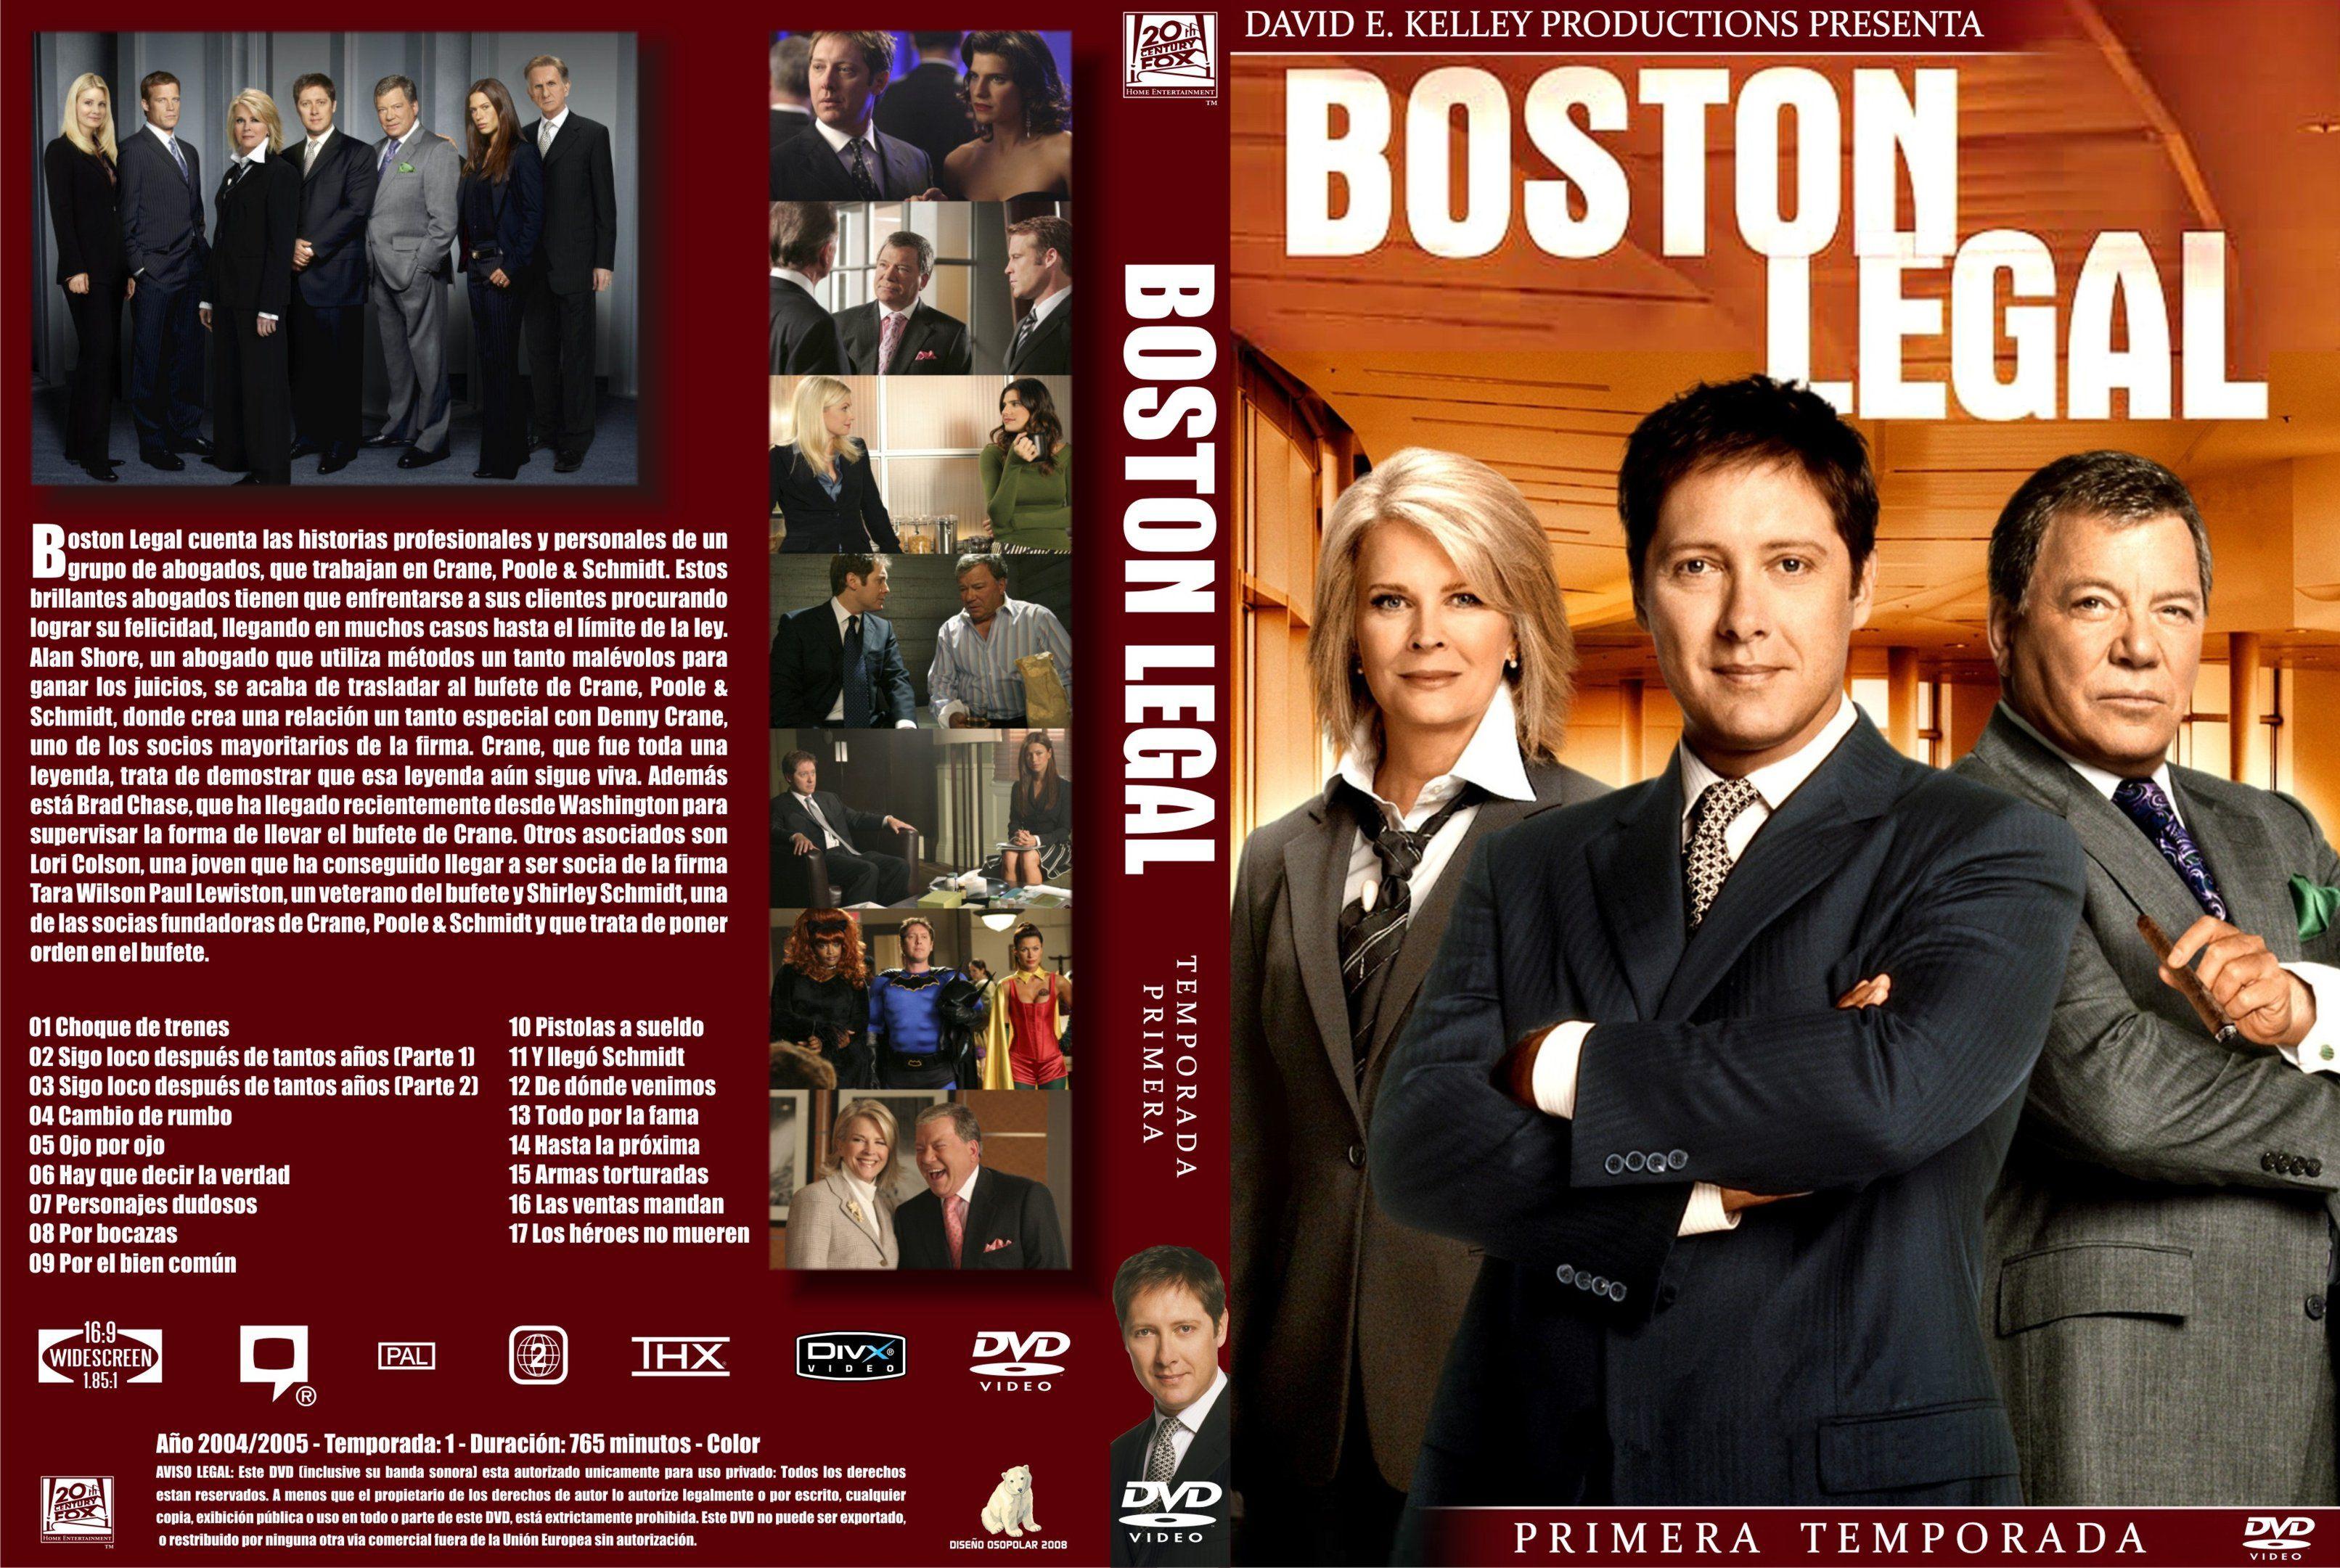 Boston Legal Imdb